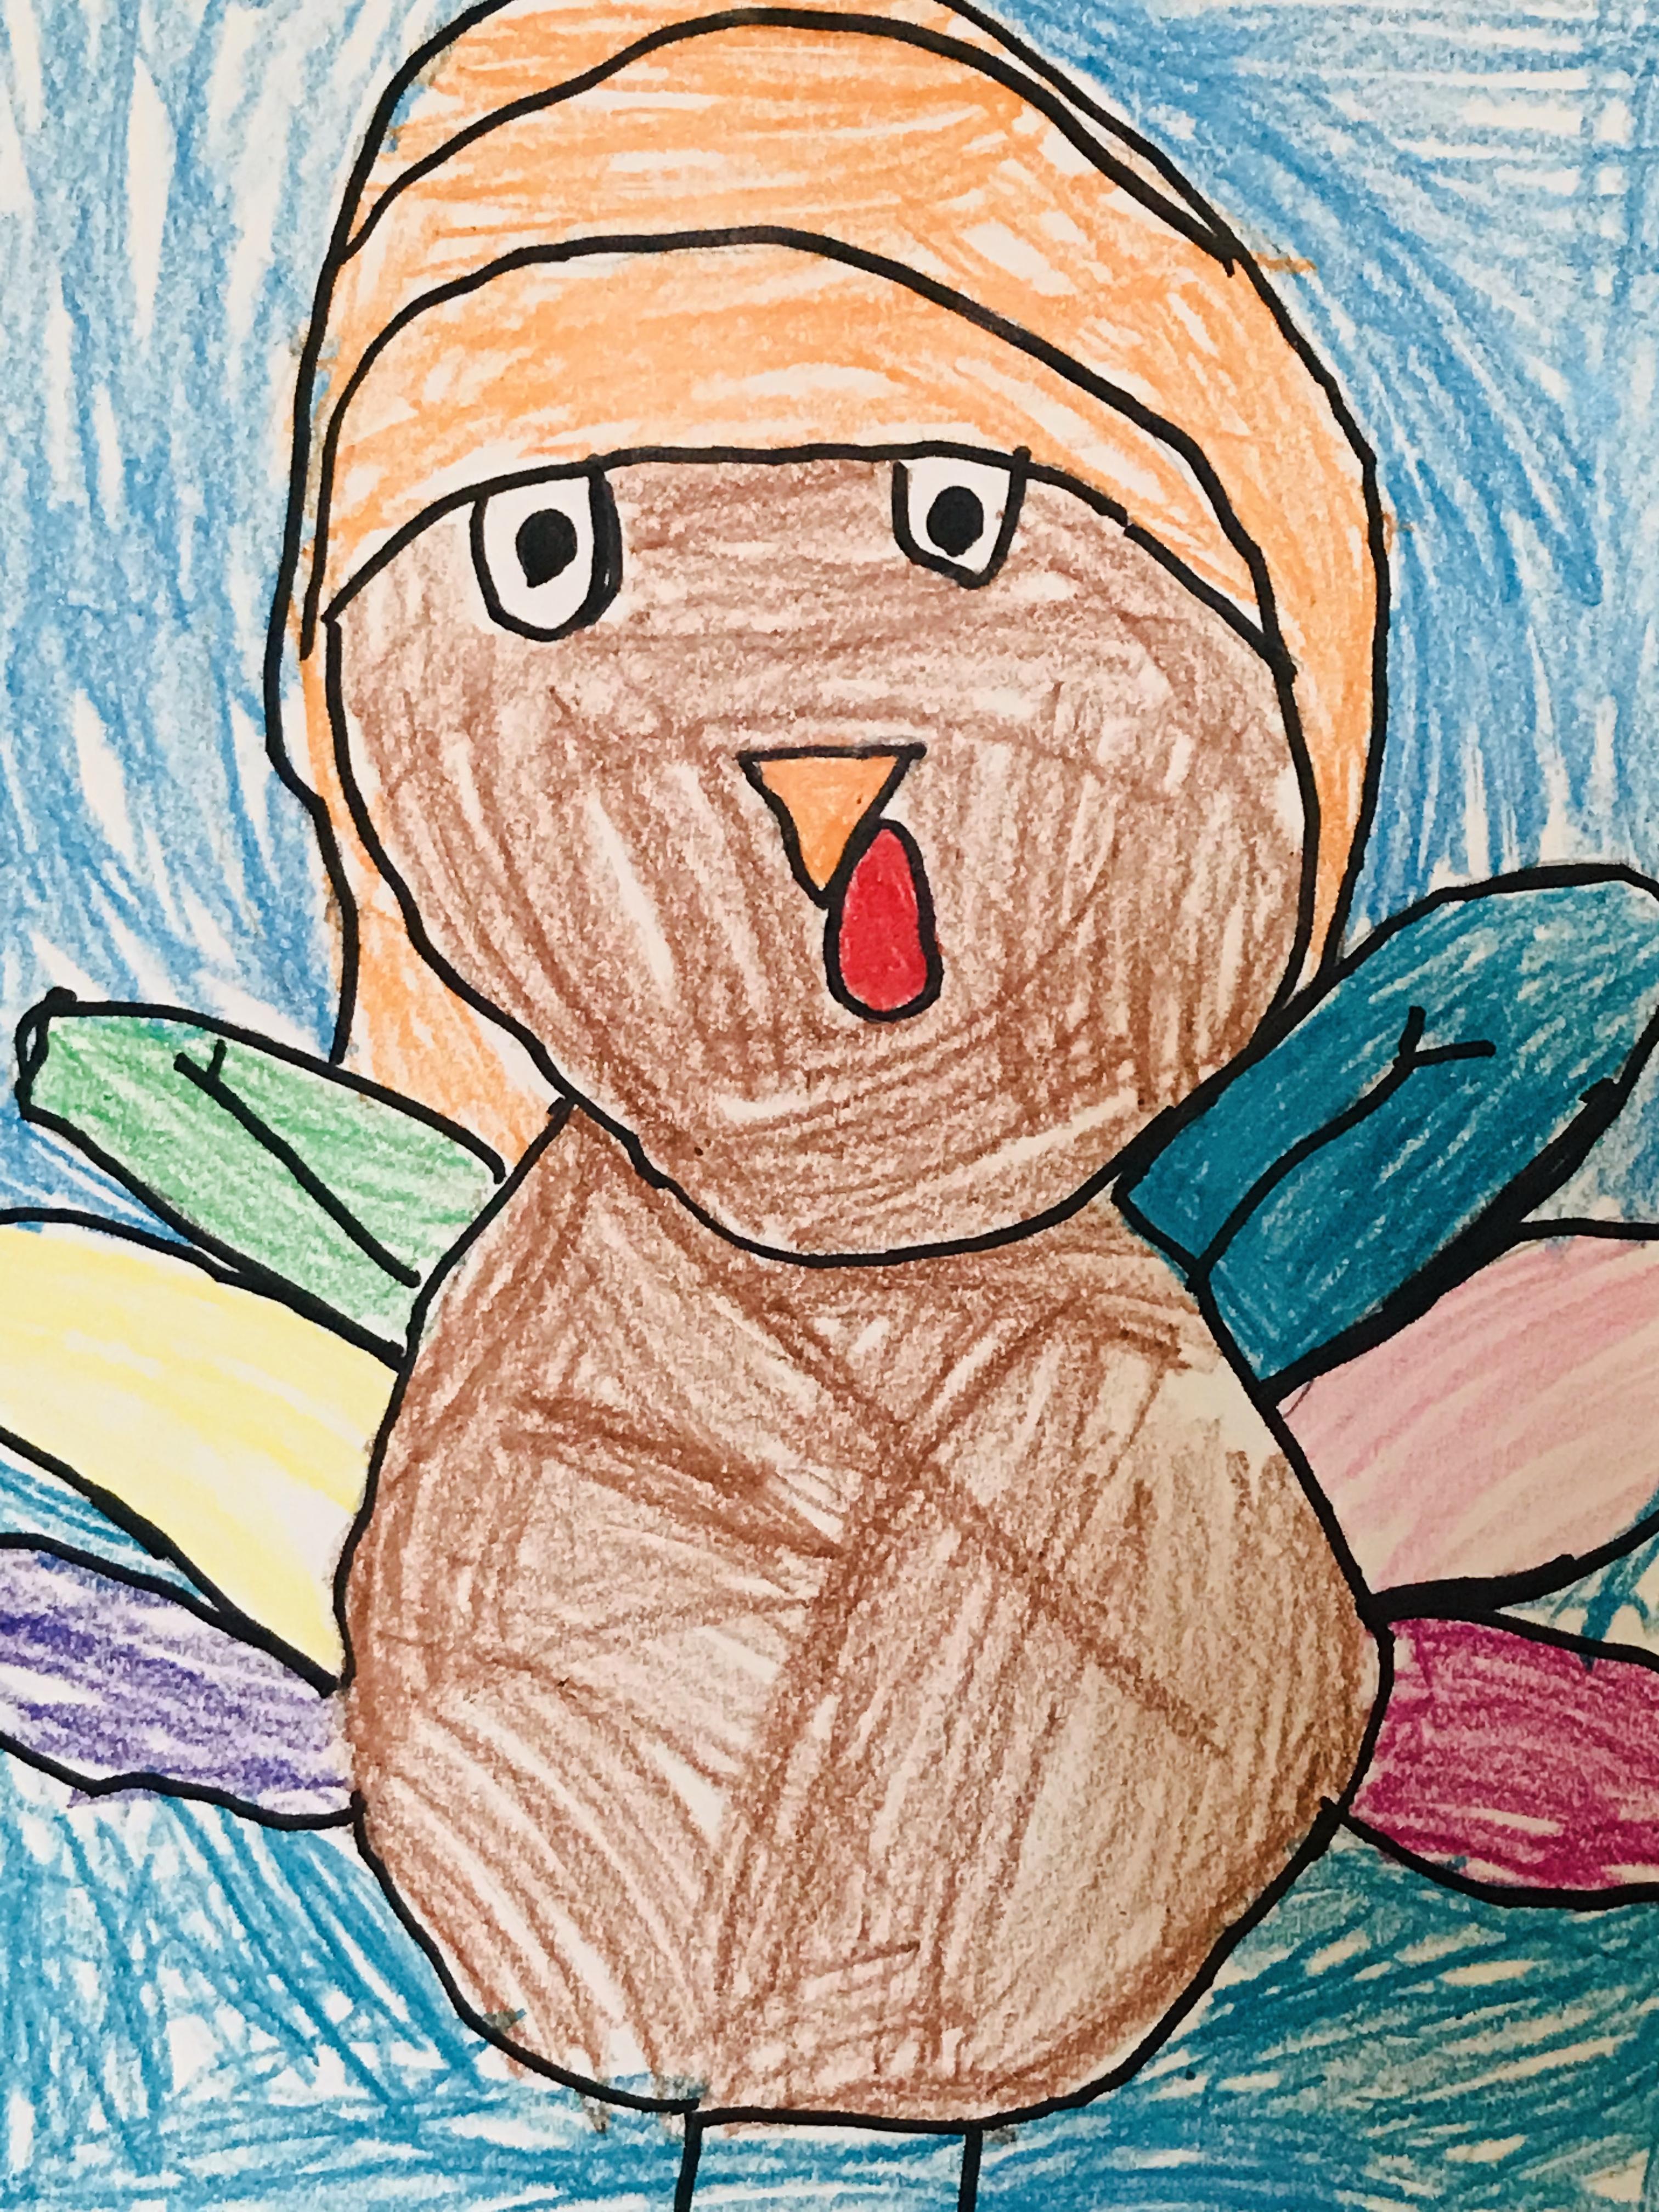 Drawn turkey with blue background